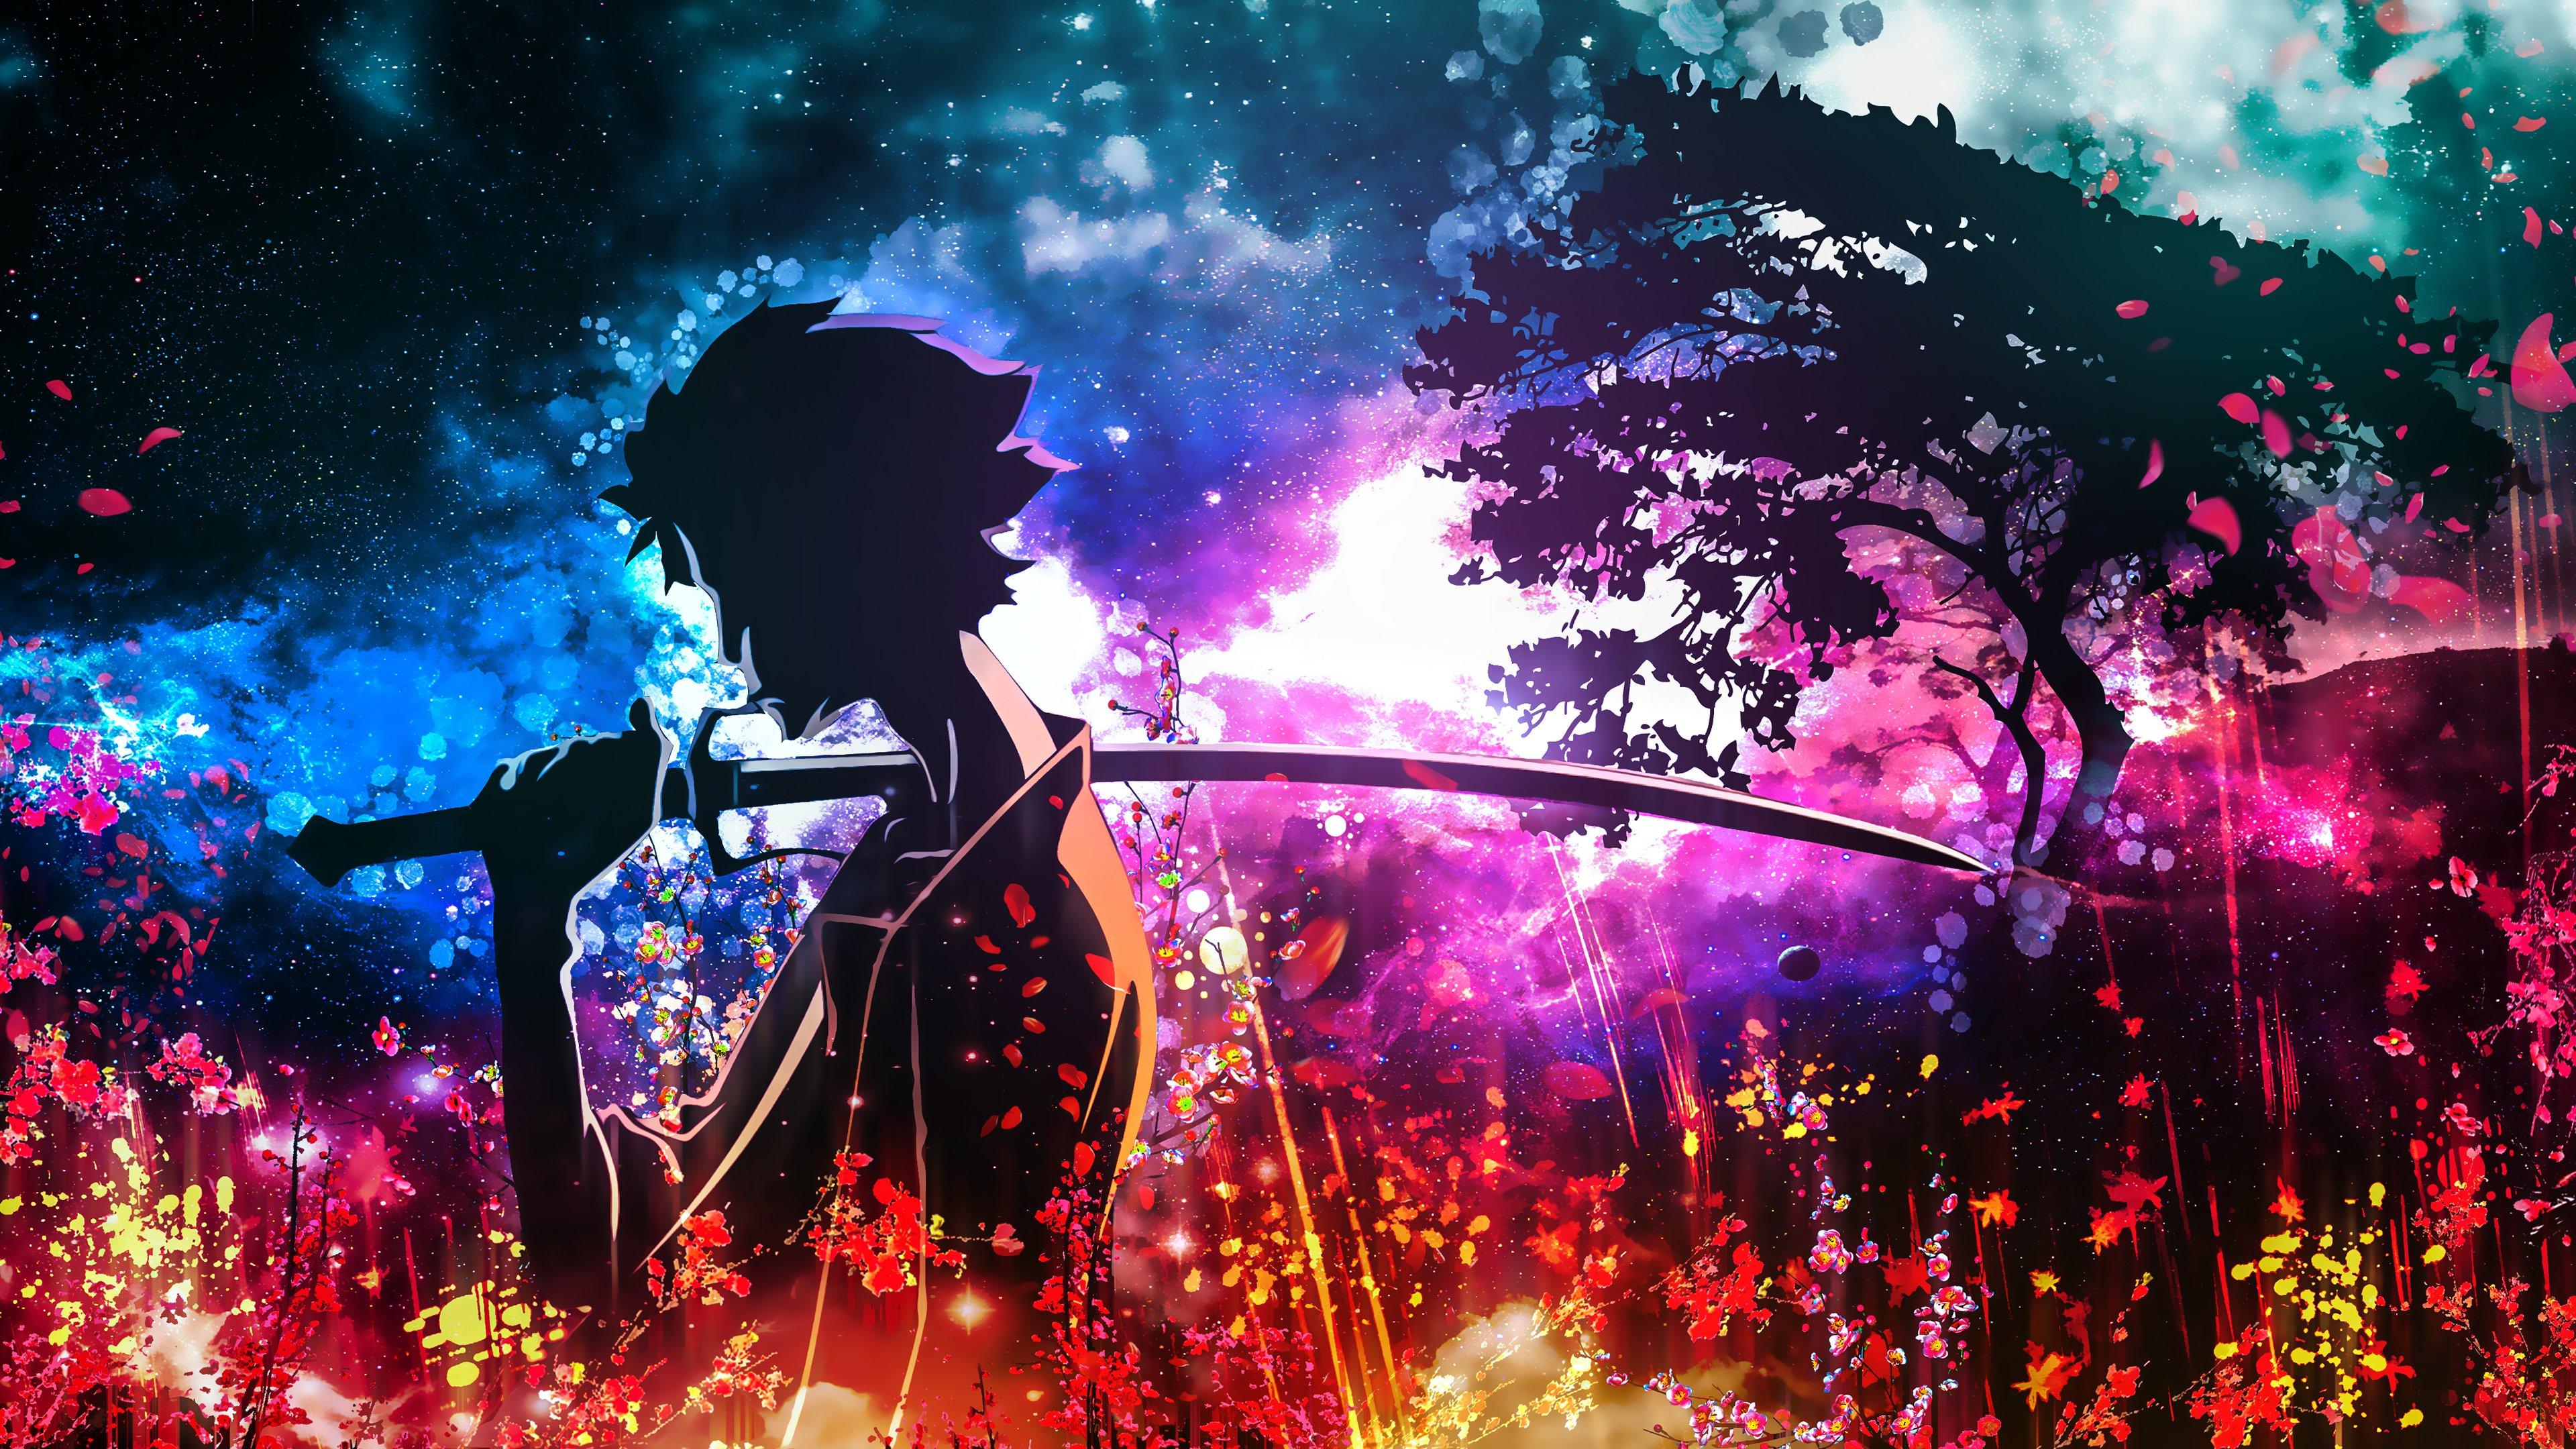 Samurai Champloo Mugen Star Sky Flower 4K Wallpaper ...